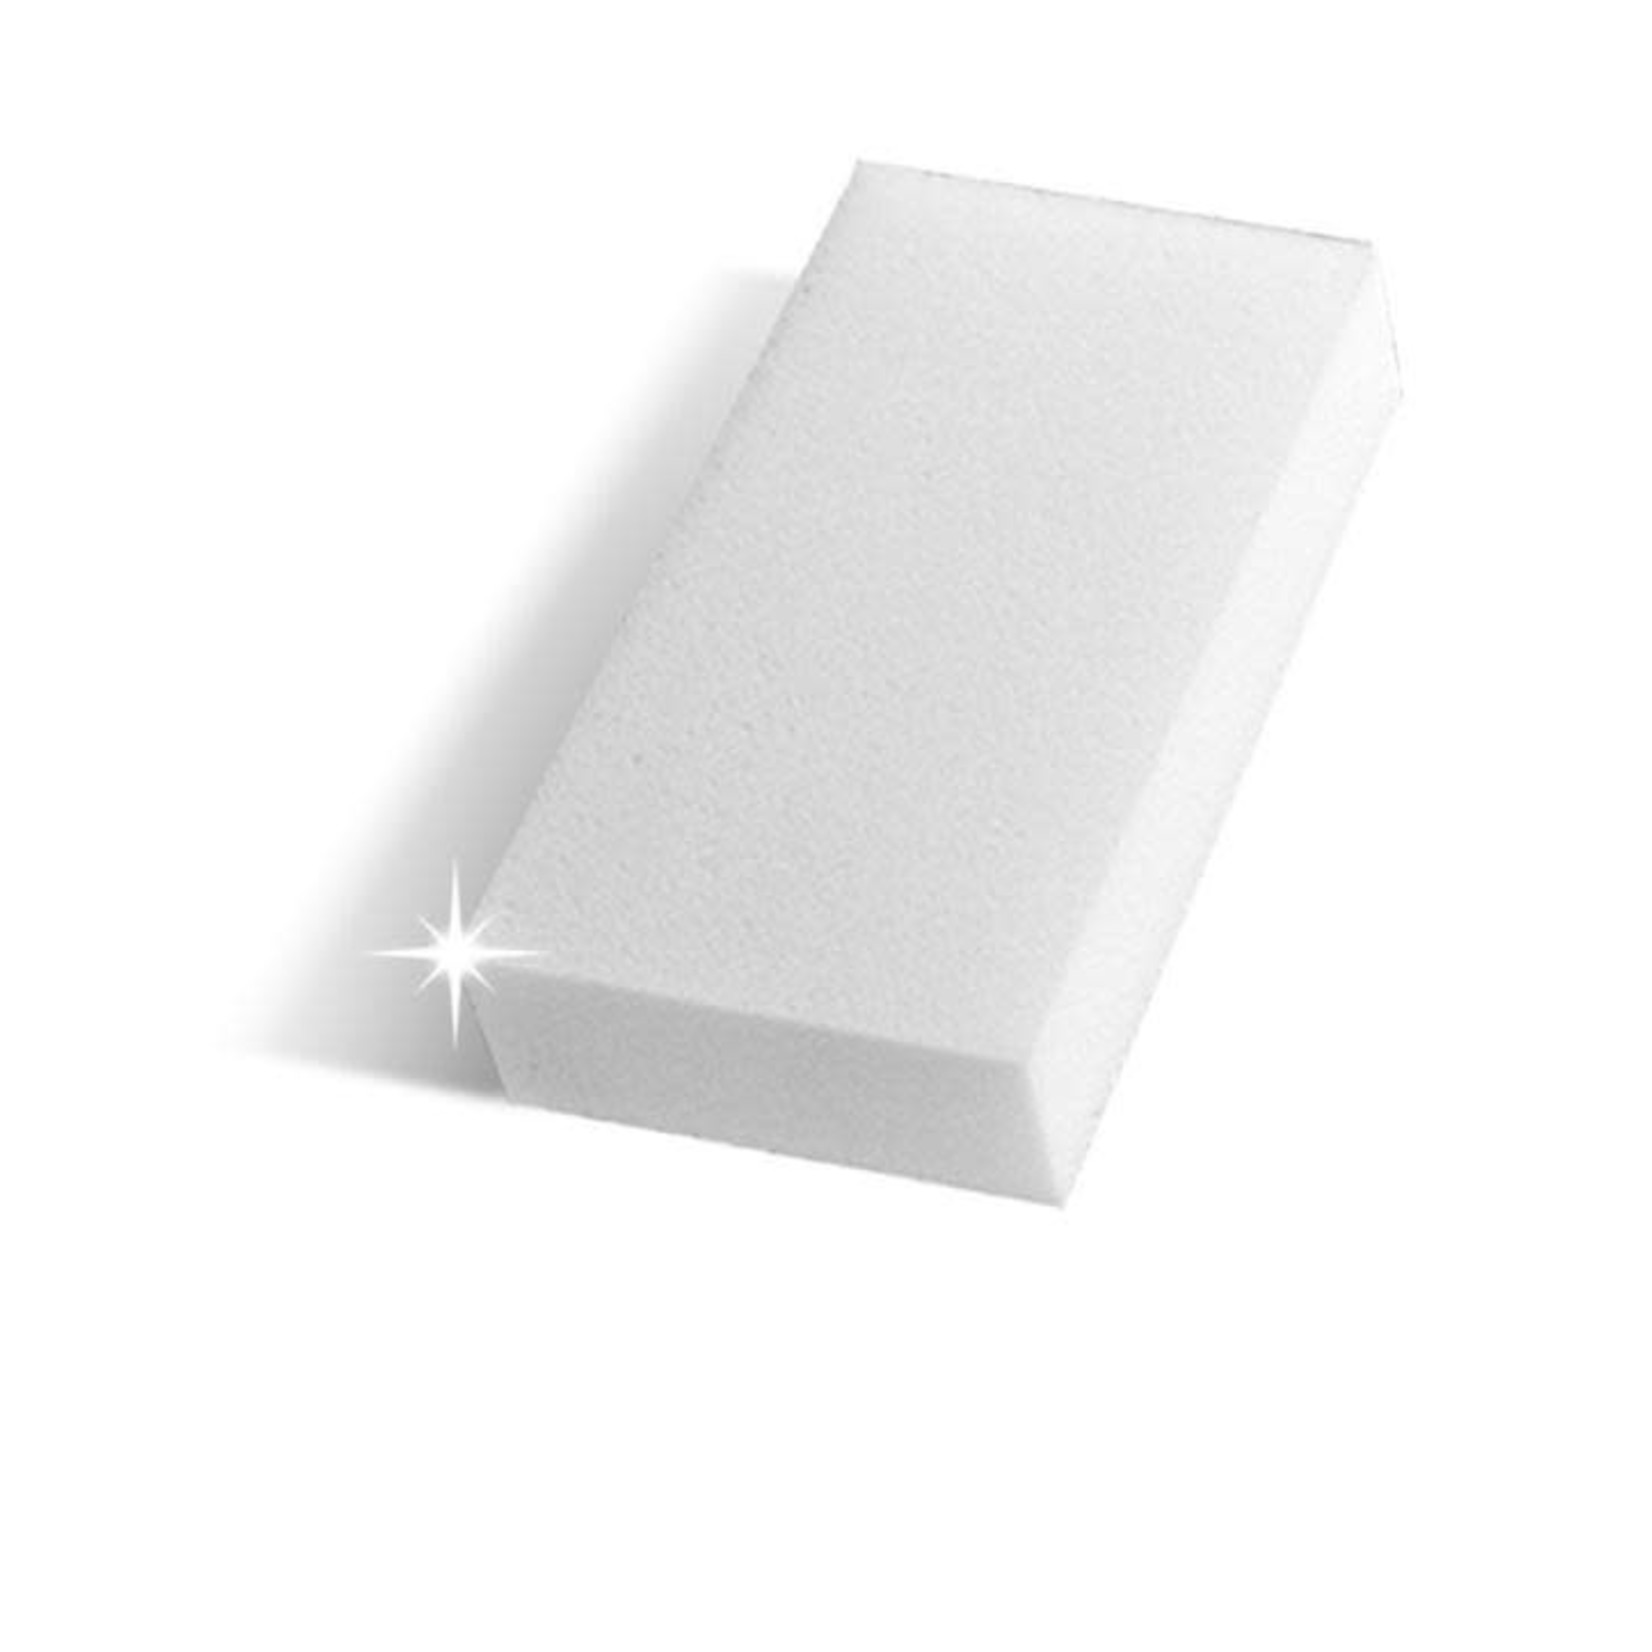 2 pc Eraser Sponge